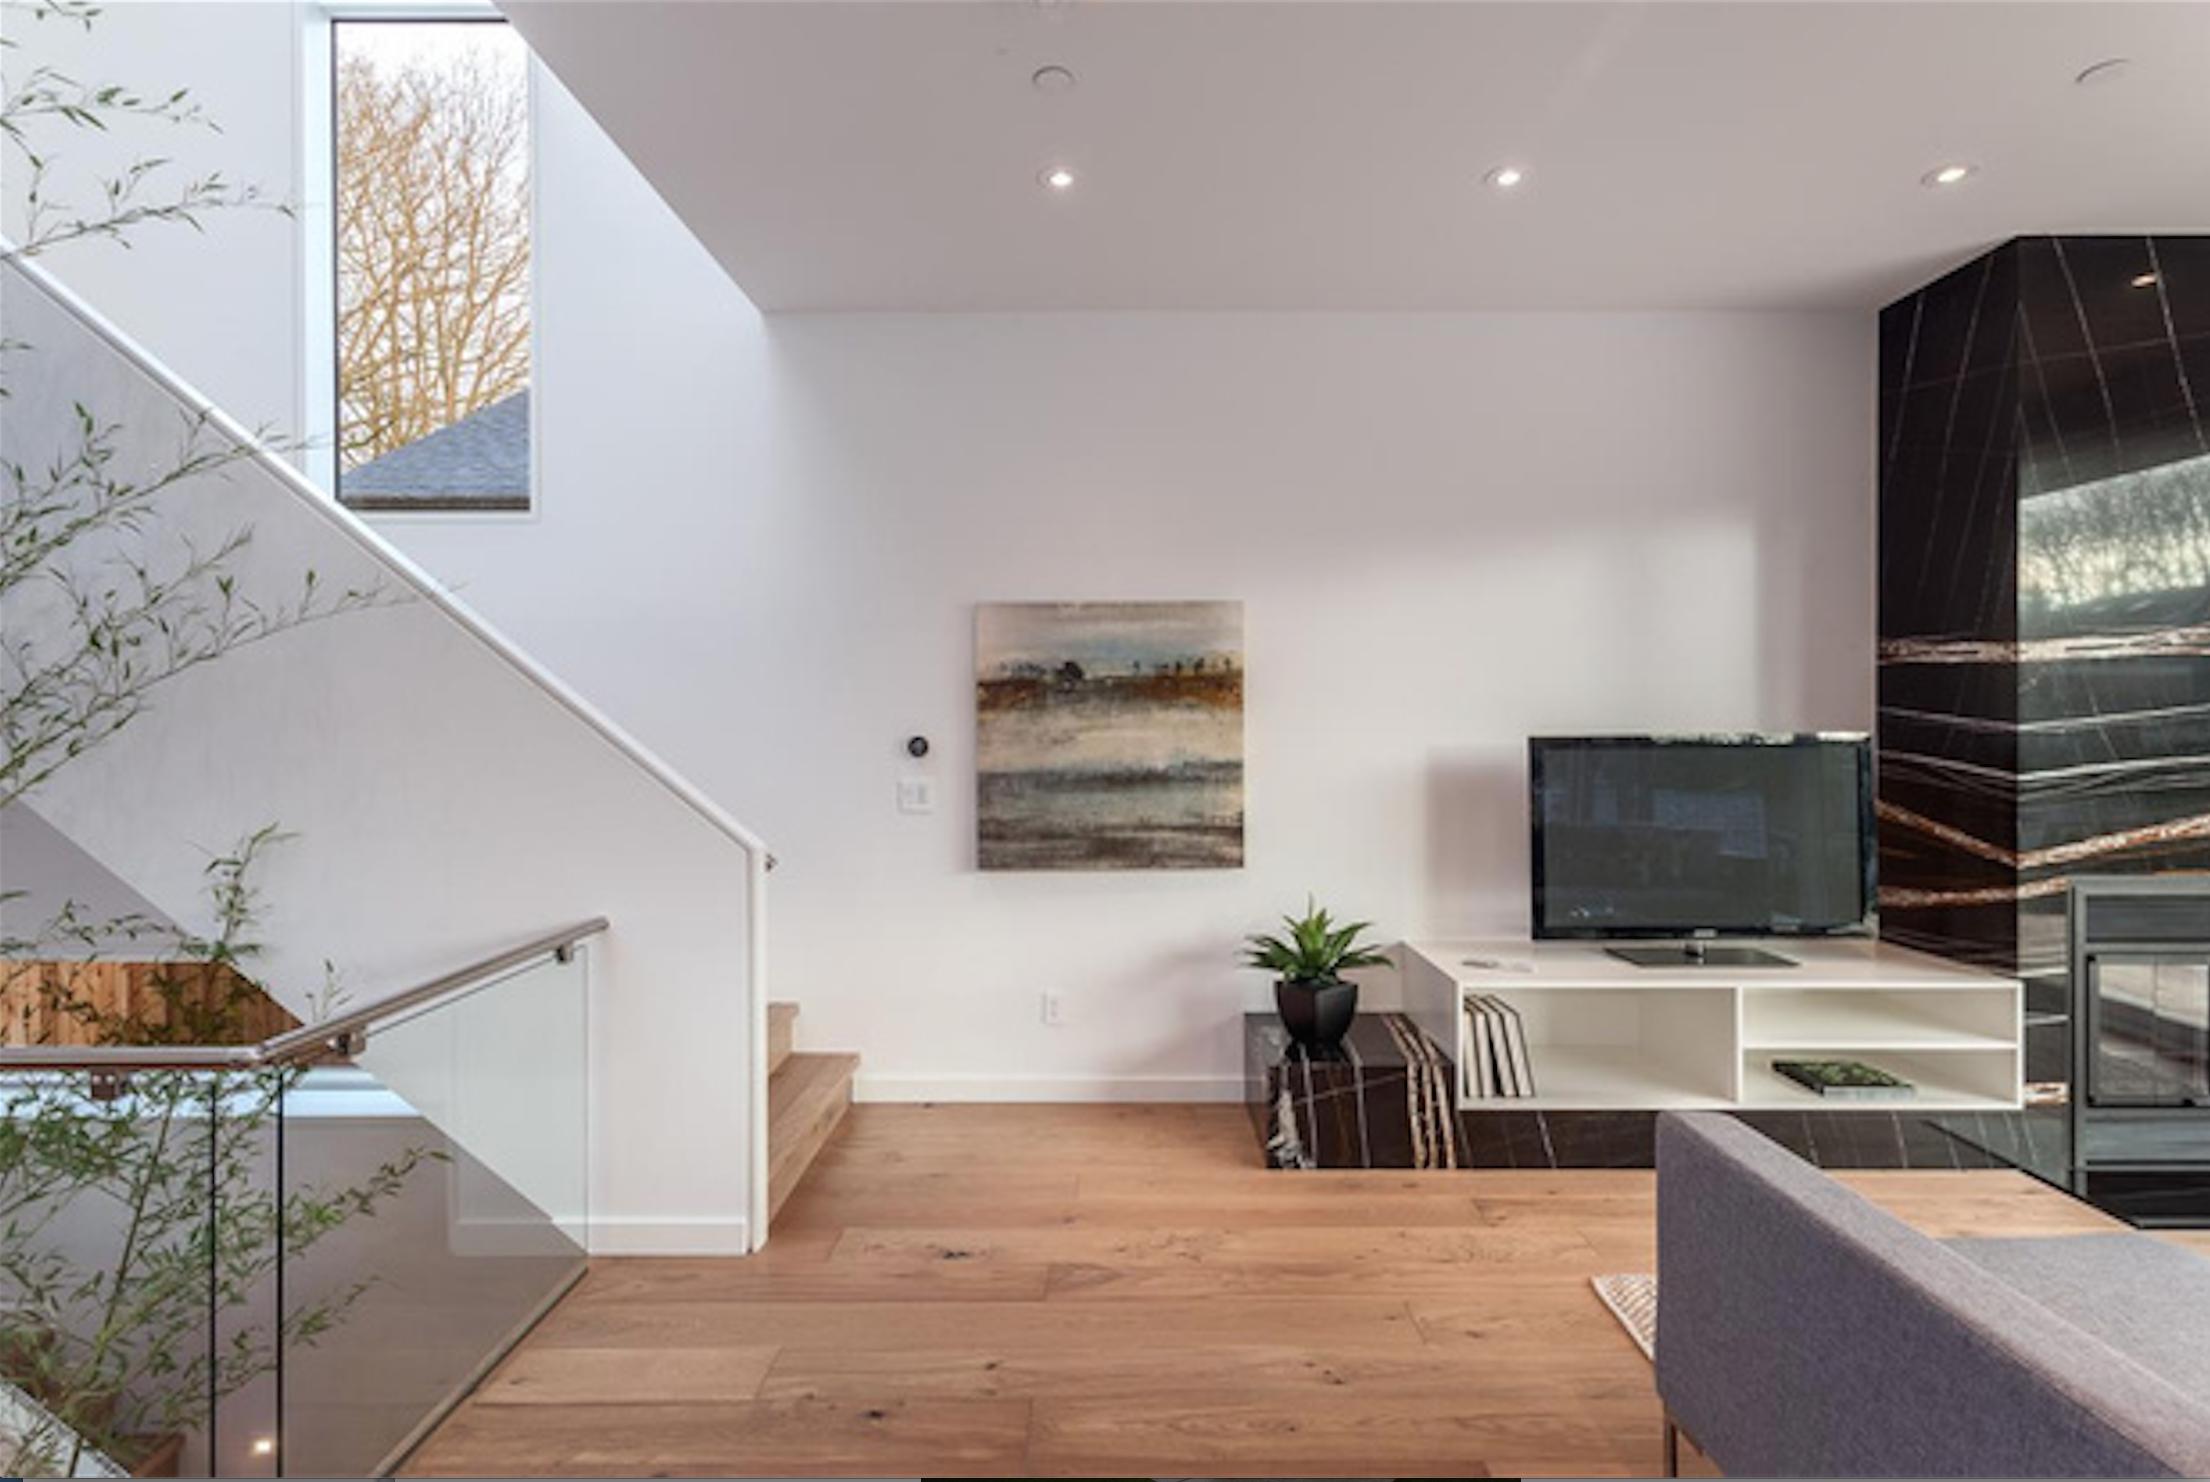 Blog vancouver modern homes albrighton real estate for Interior design show vancouver 2016